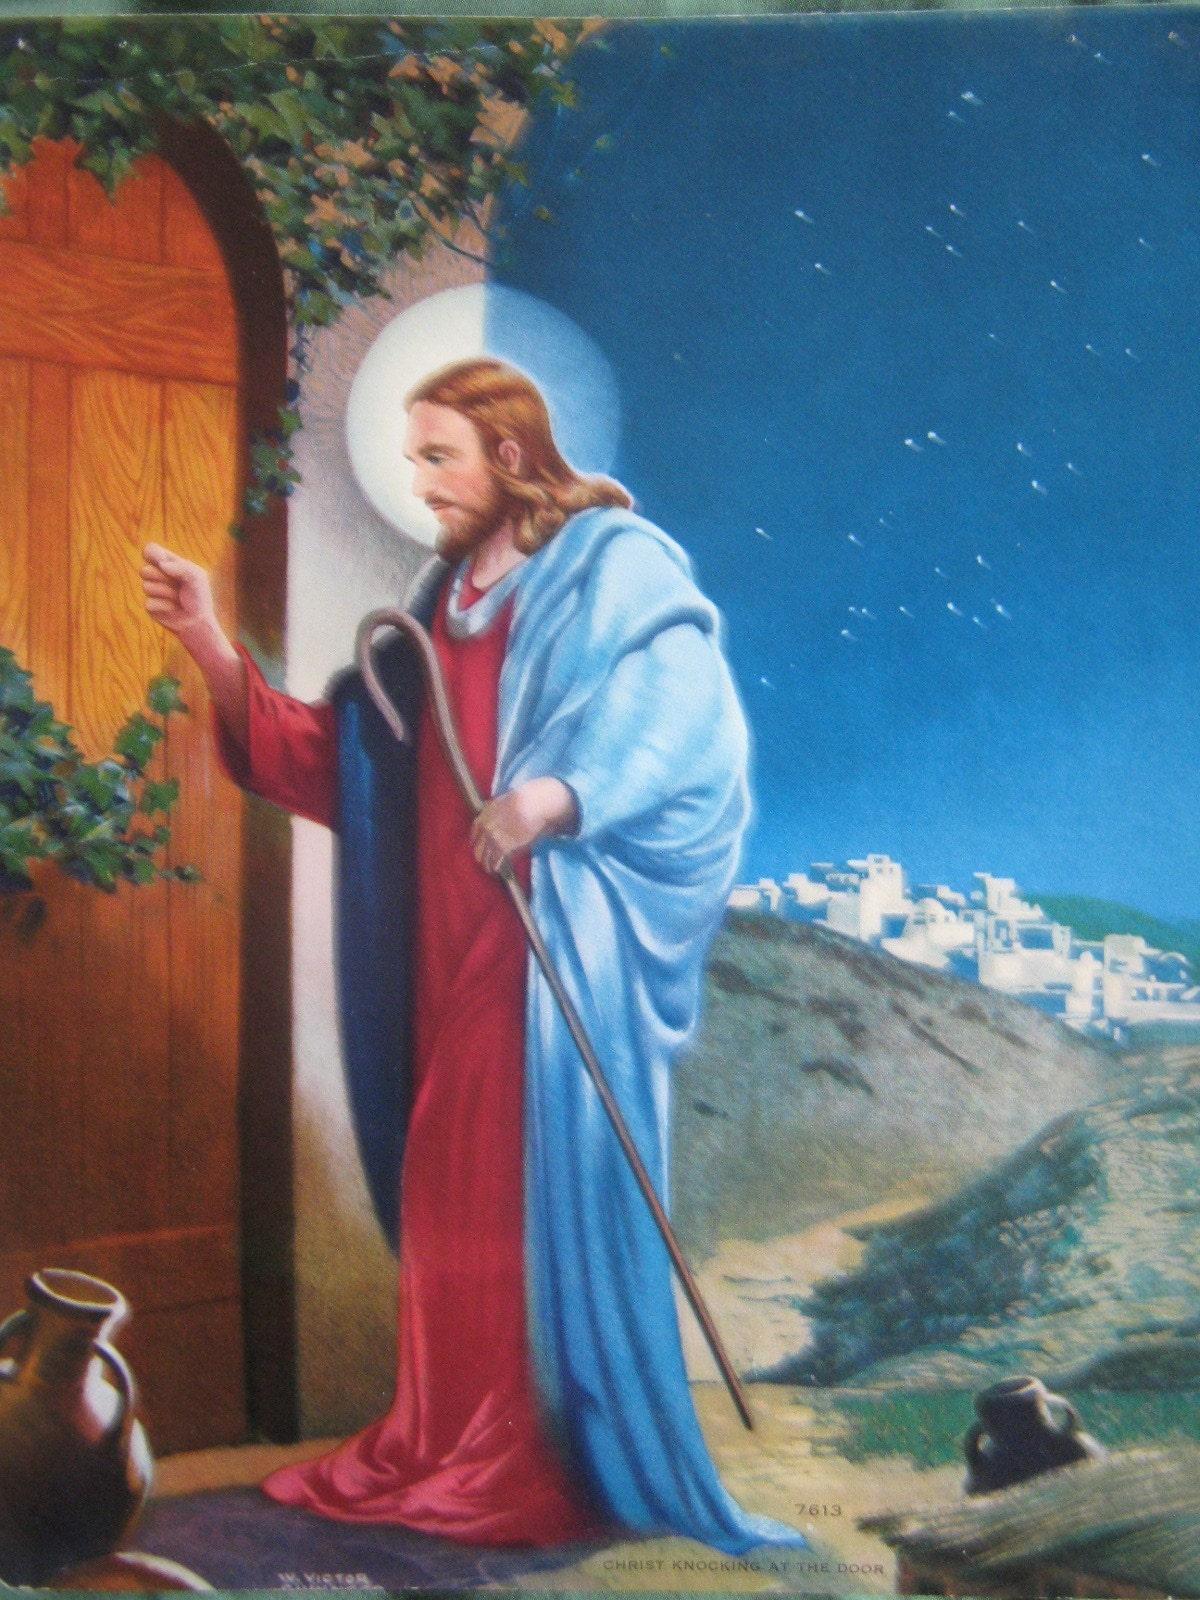 Vintage 1950 S Jesus Christ Knocking At The Door Print